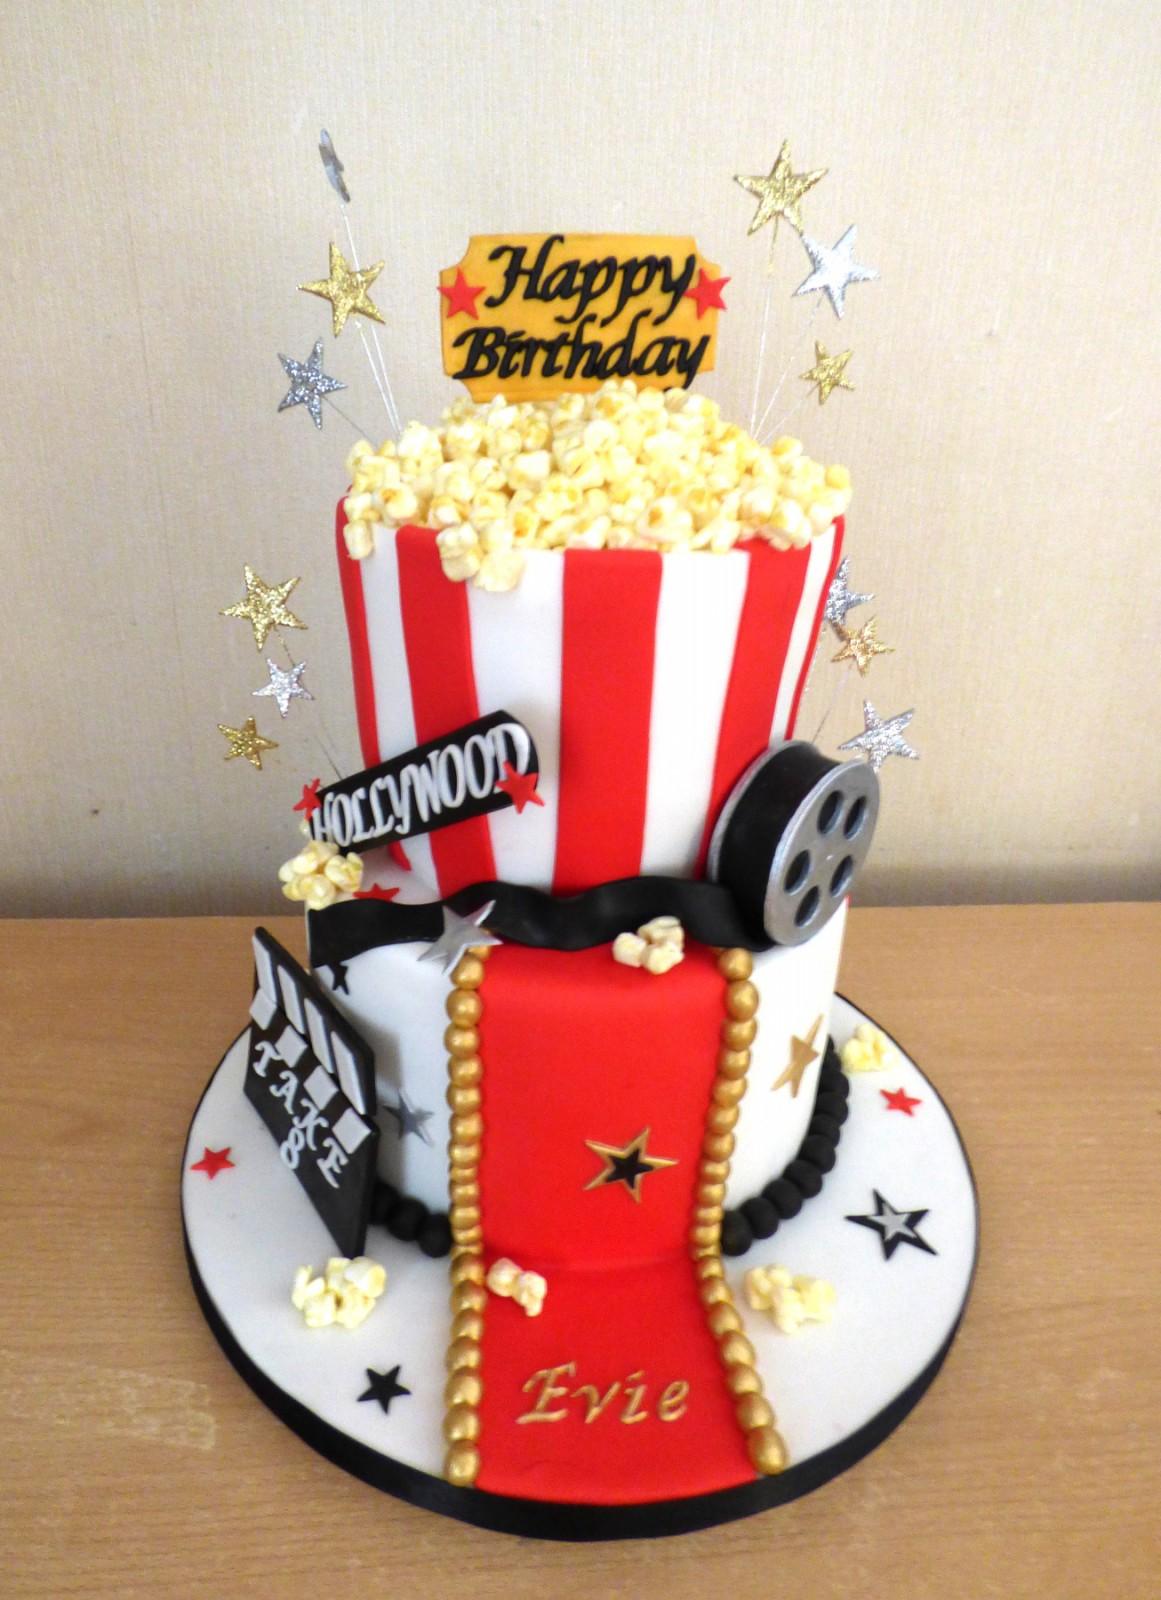 Groovy 2 Tier Movie Themed Birthday Cake Susies Cakes Funny Birthday Cards Online Alyptdamsfinfo